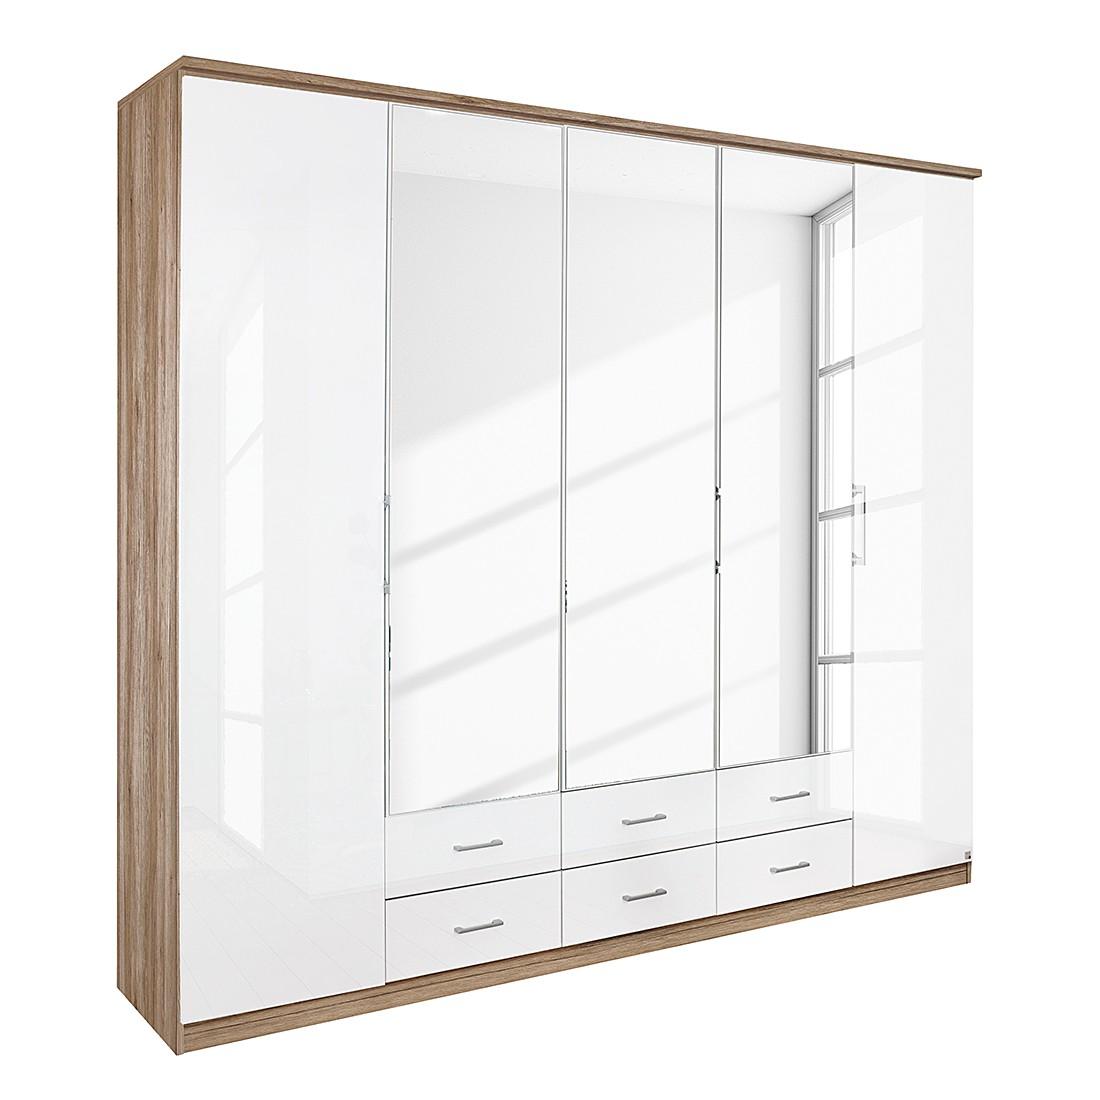 Armoire à portes pliantes Ellwangen - Imitation chêne de San Remo / Blanc brillant - 136 x 199 cm -